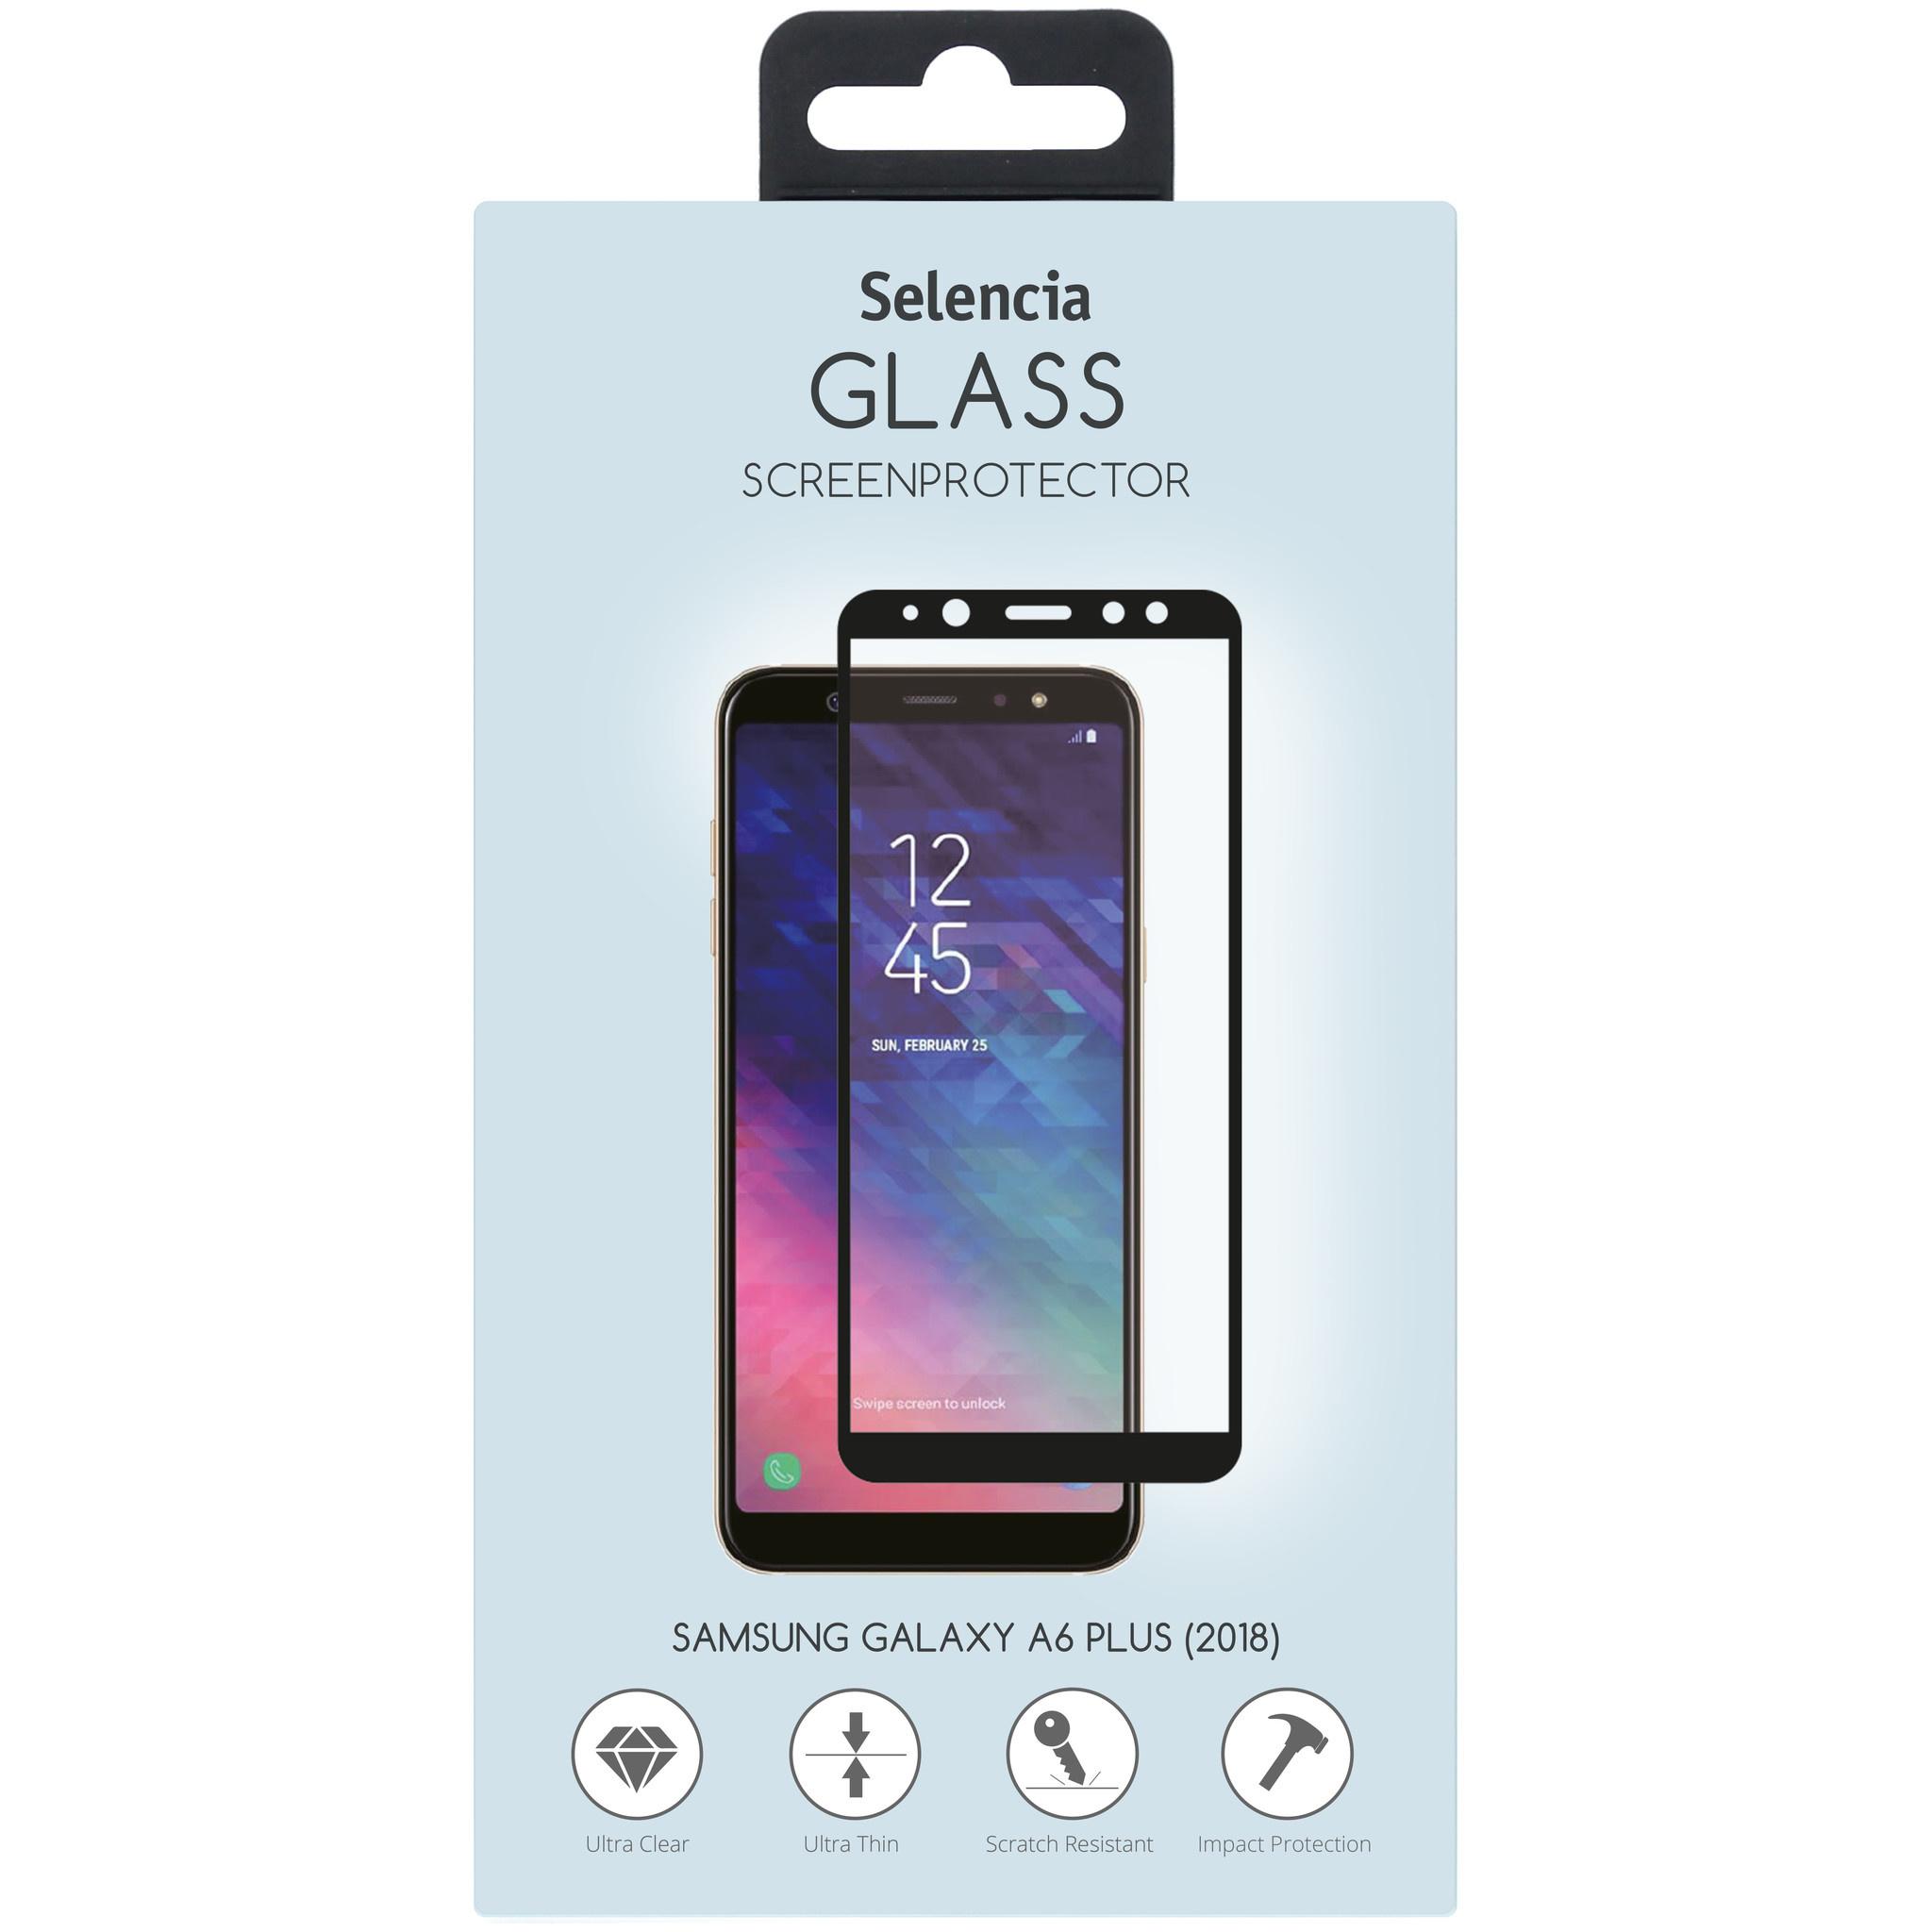 Selencia Displayschutz gehärtetem Glas Samsung Galaxy A6 Plus (2018)